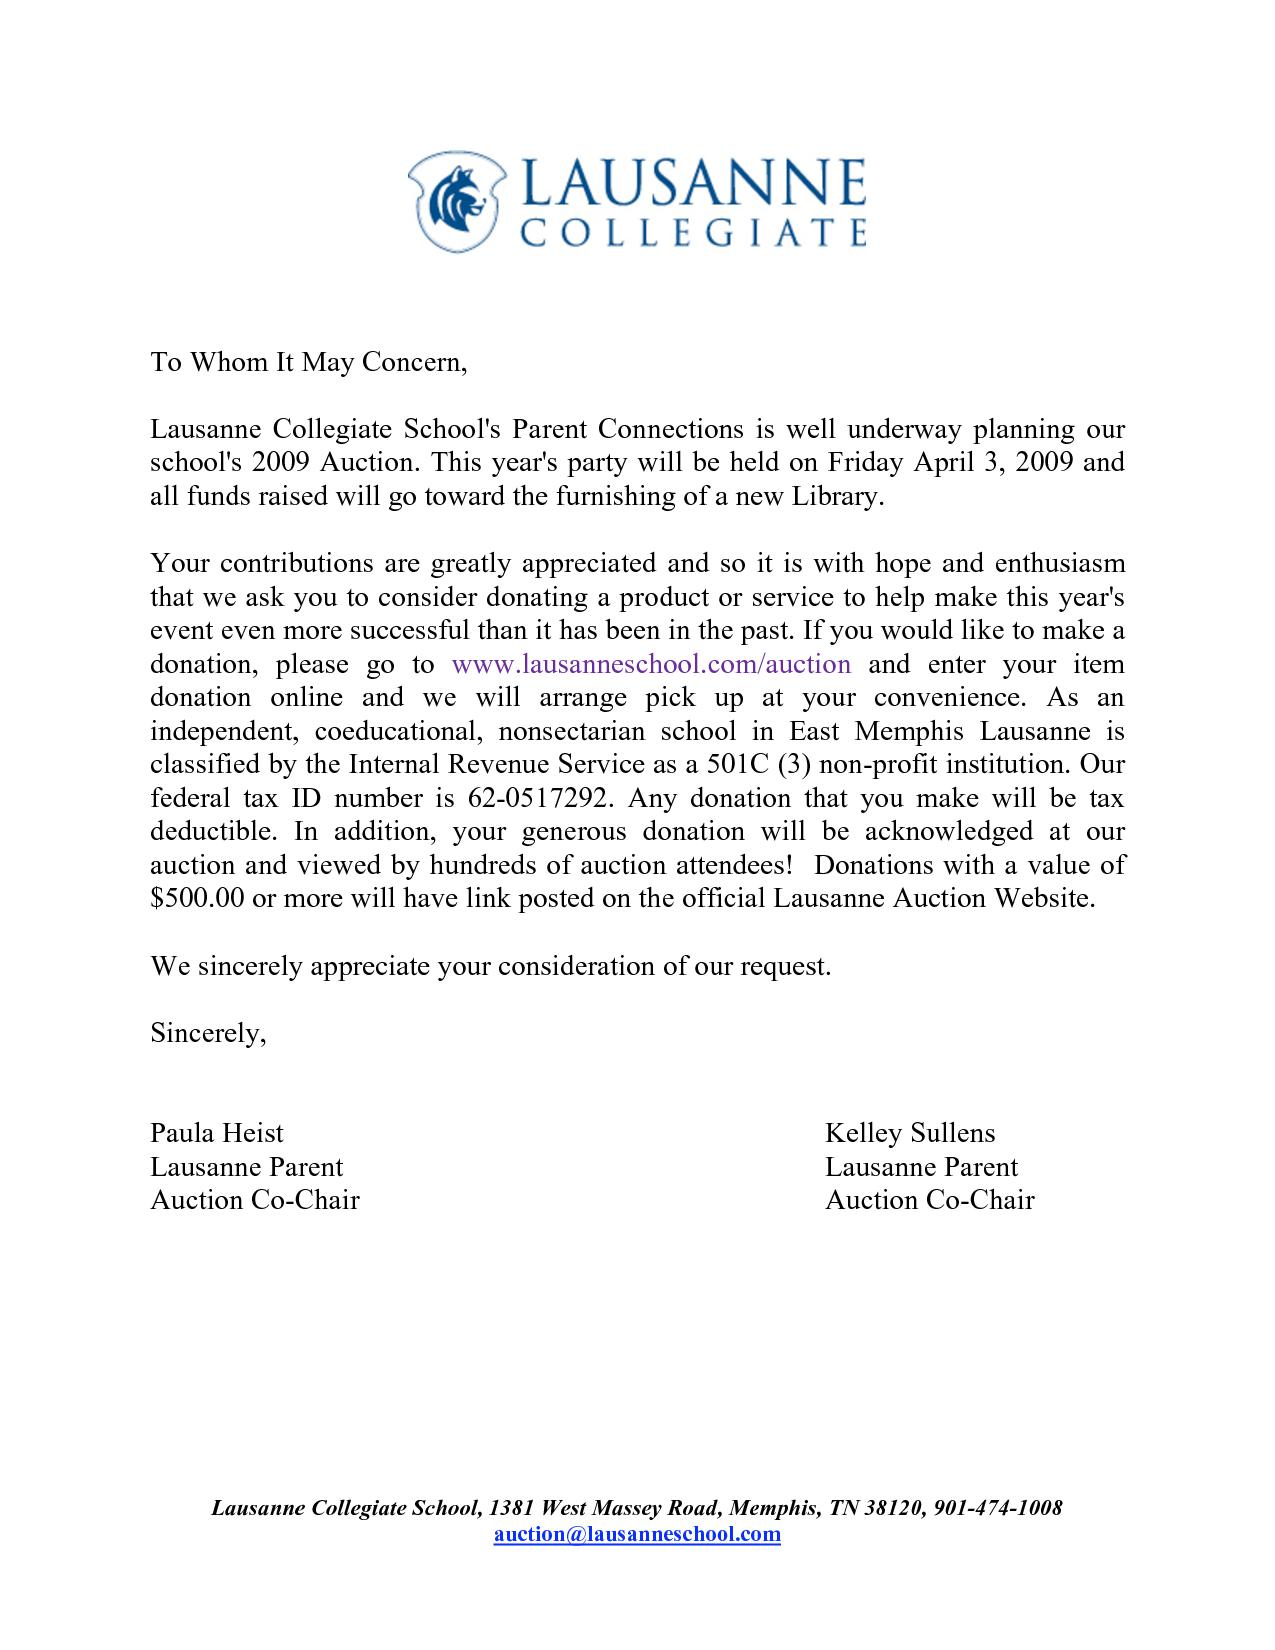 business donation request letter art chainimage template